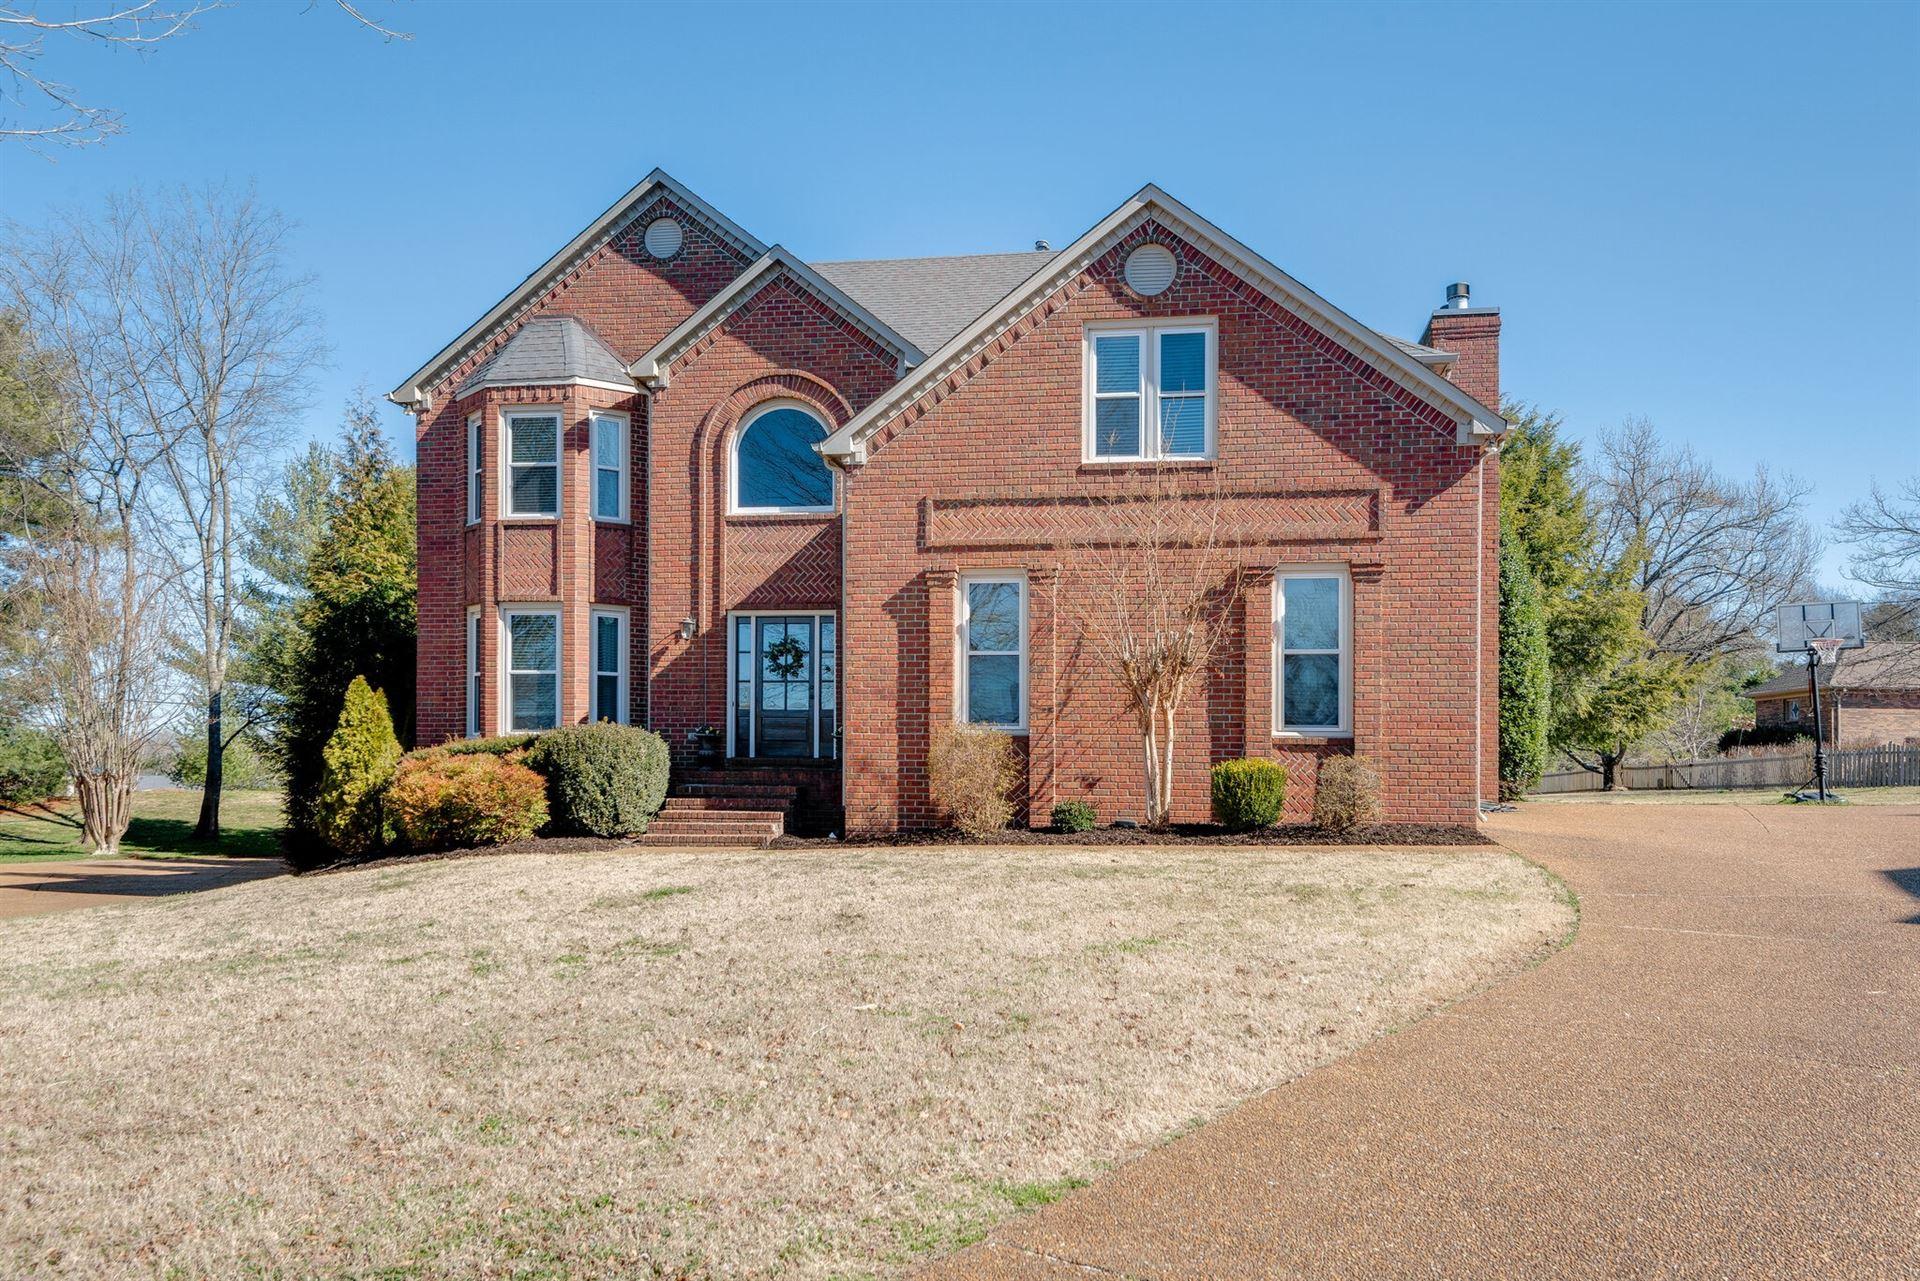 1502 Forest Garden Dr, Brentwood, TN 37027 - MLS#: 2233161